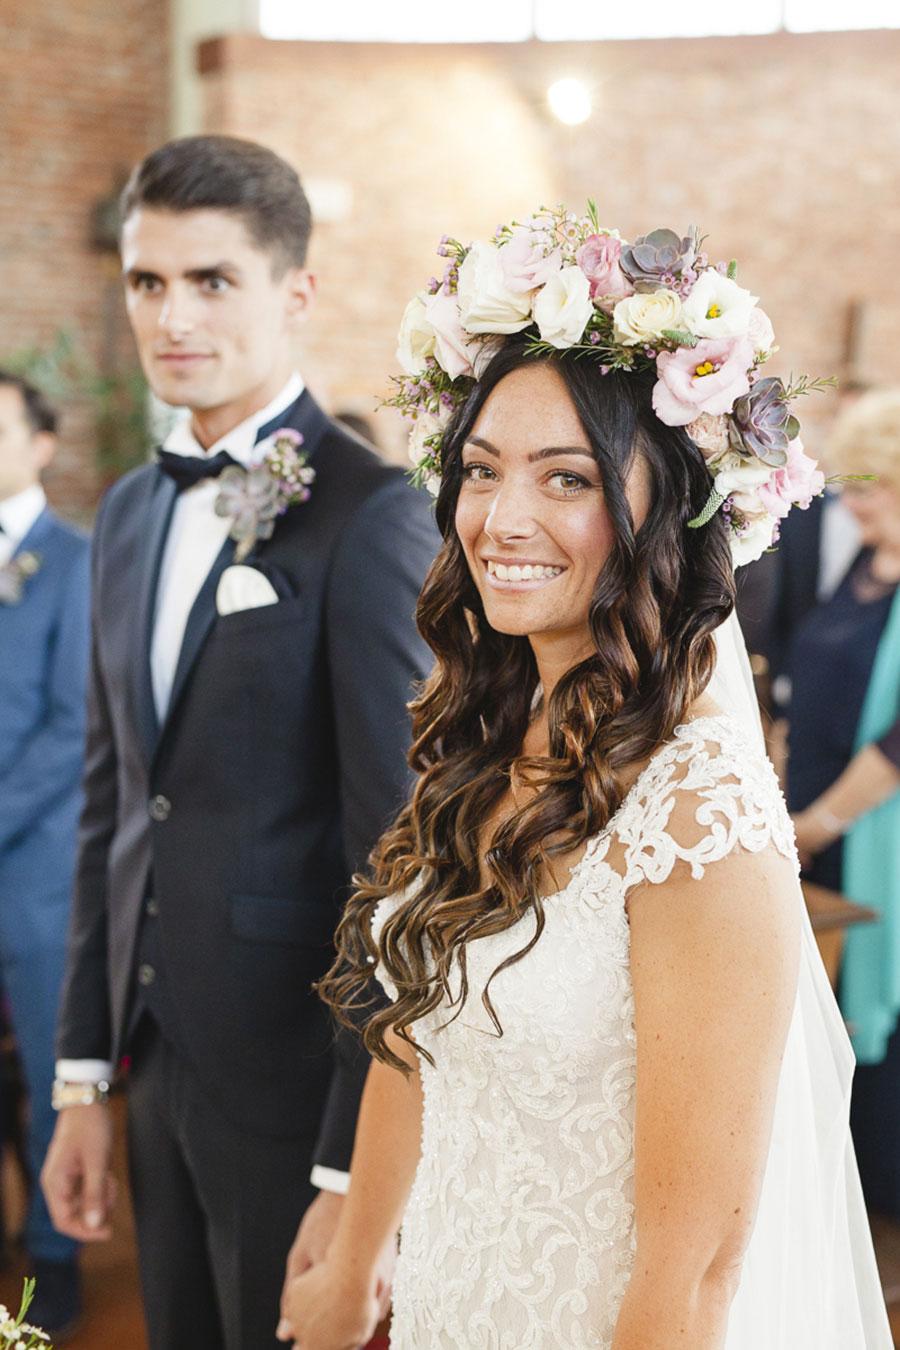 Wedding-Nicholad-and-Federica-Giuseppe-Giovannelli-140